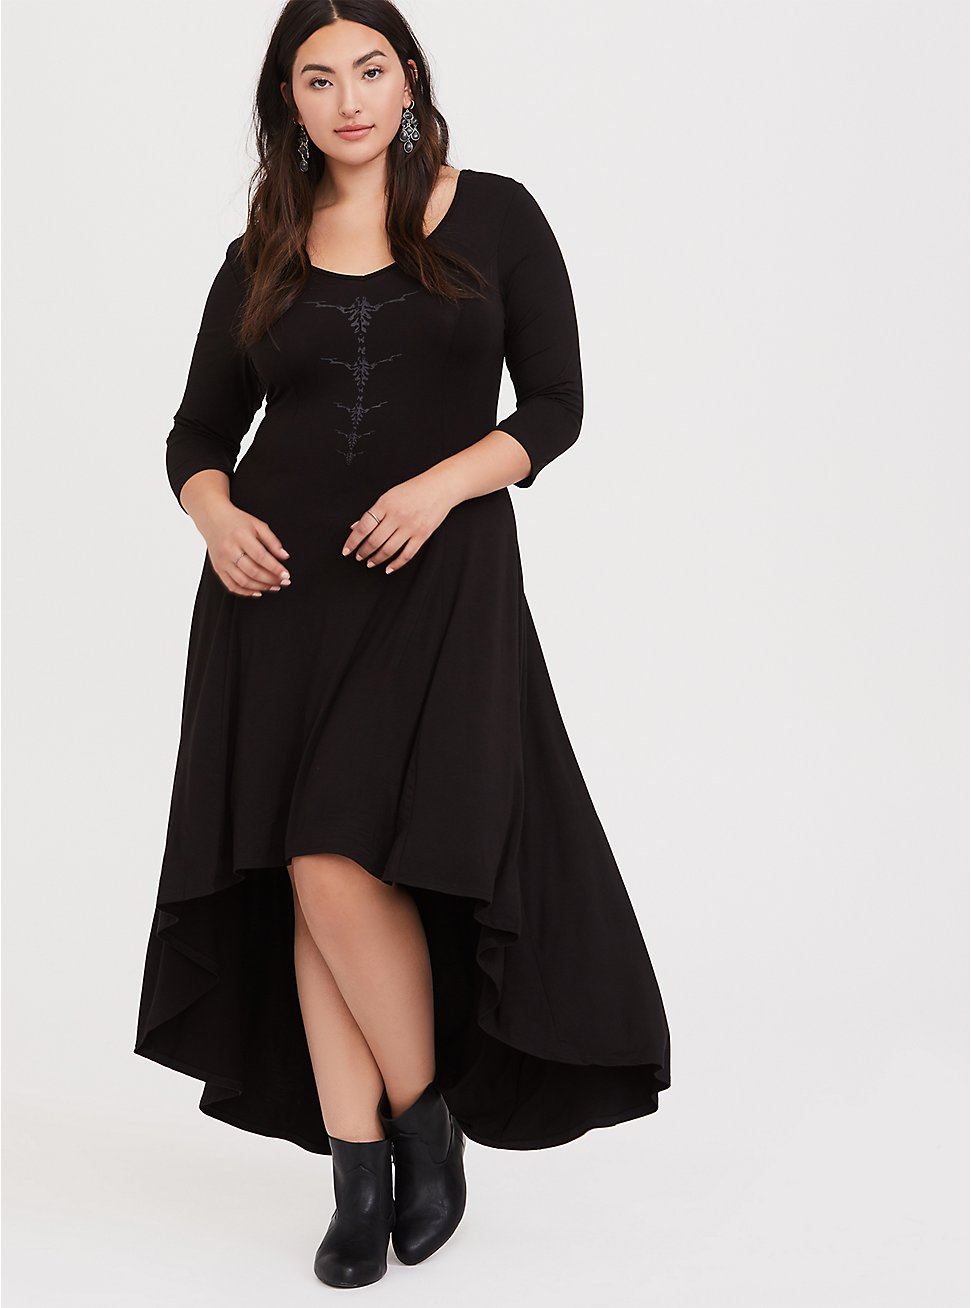 Her Universe Disney Maleficent 2 Black Jersey Hi Lo Dress